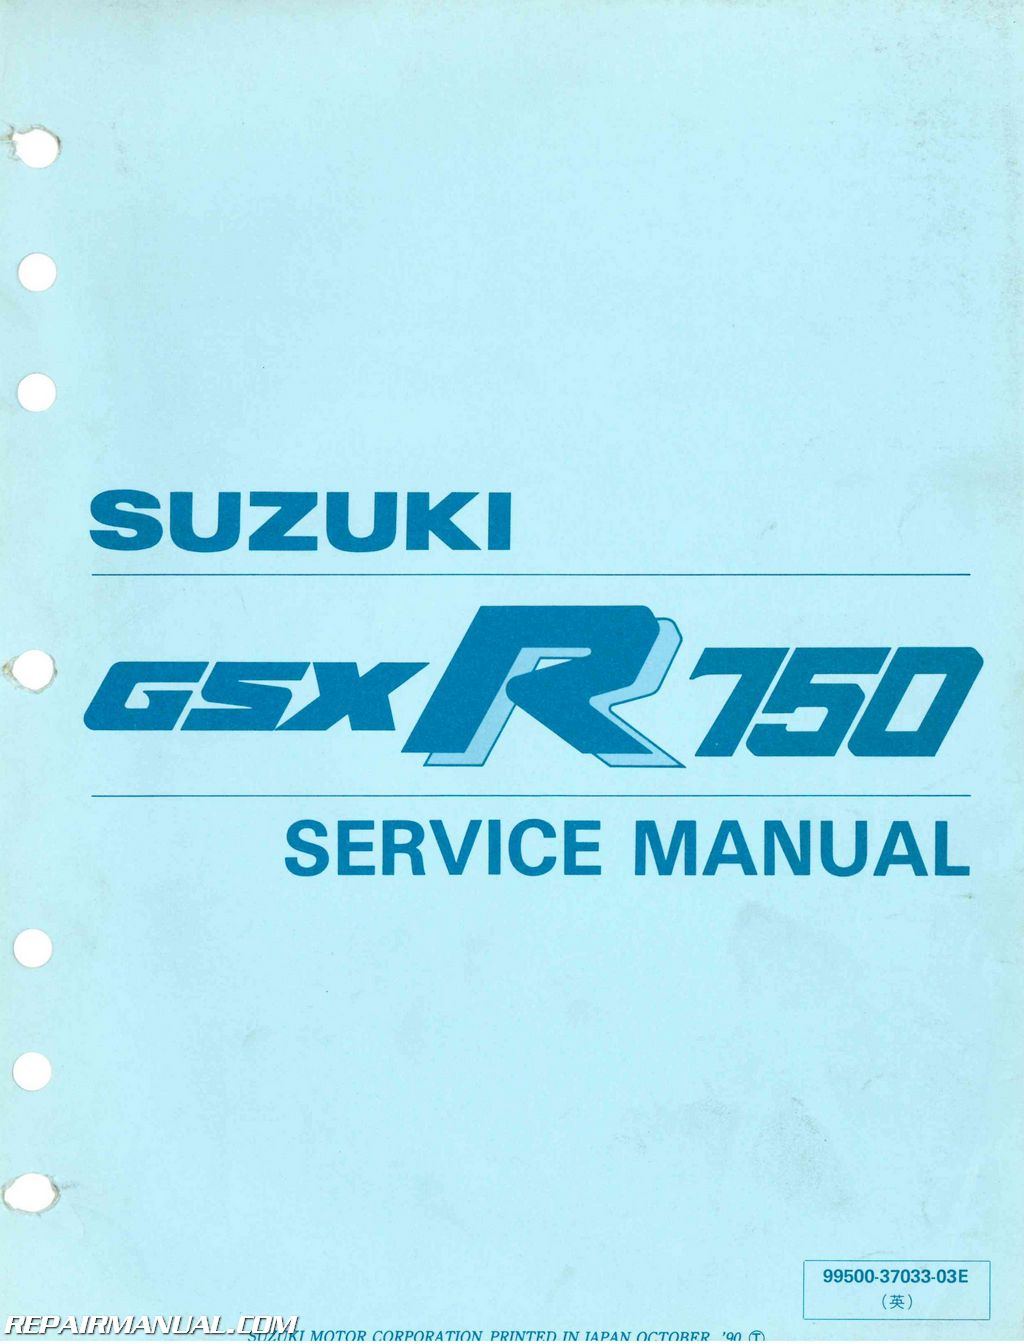 1986 1990 suzuki gsxr750 motorcycle service manual rh repairmanual com 2006 gsxr 750 service manual suzuki gsx 750 workshop manual